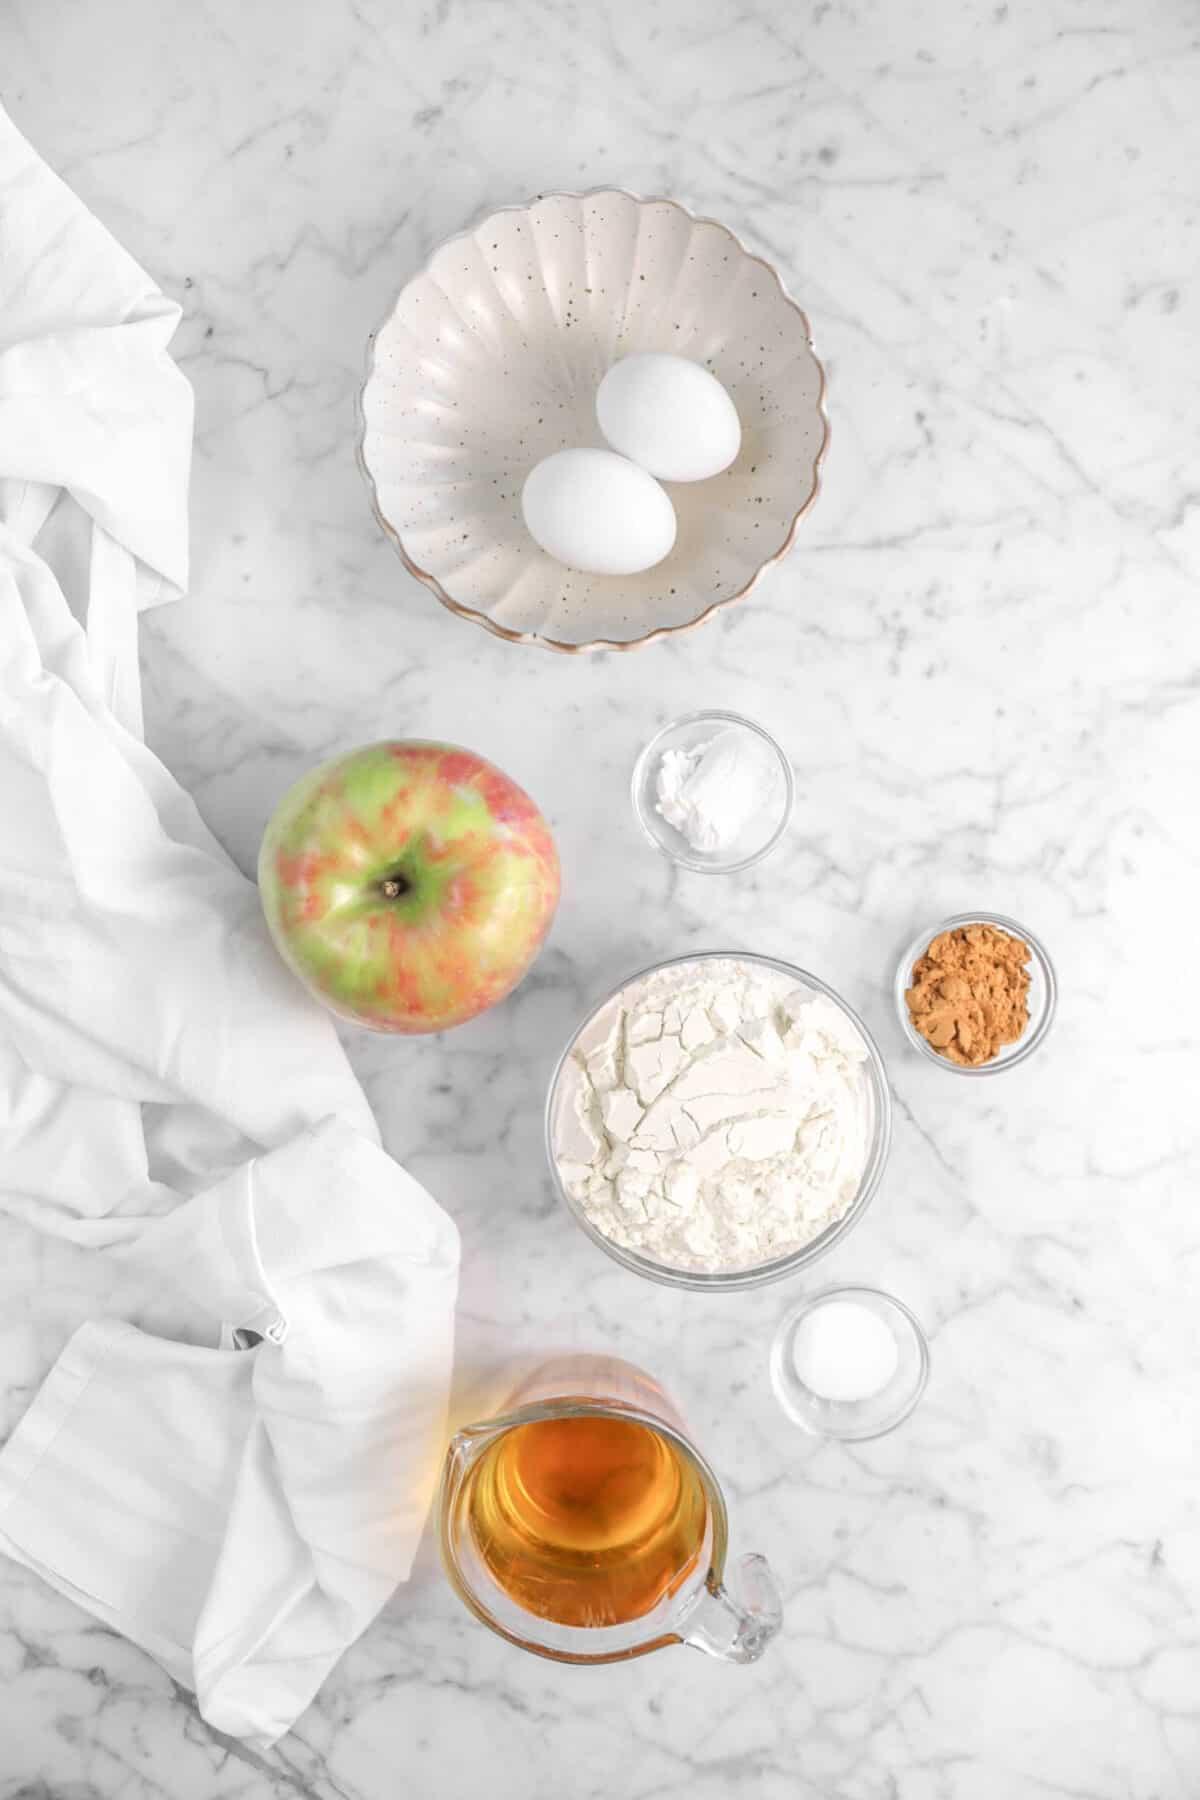 eggs, baking powder, an apple, flour, apple pie spice, salt, and apple juice